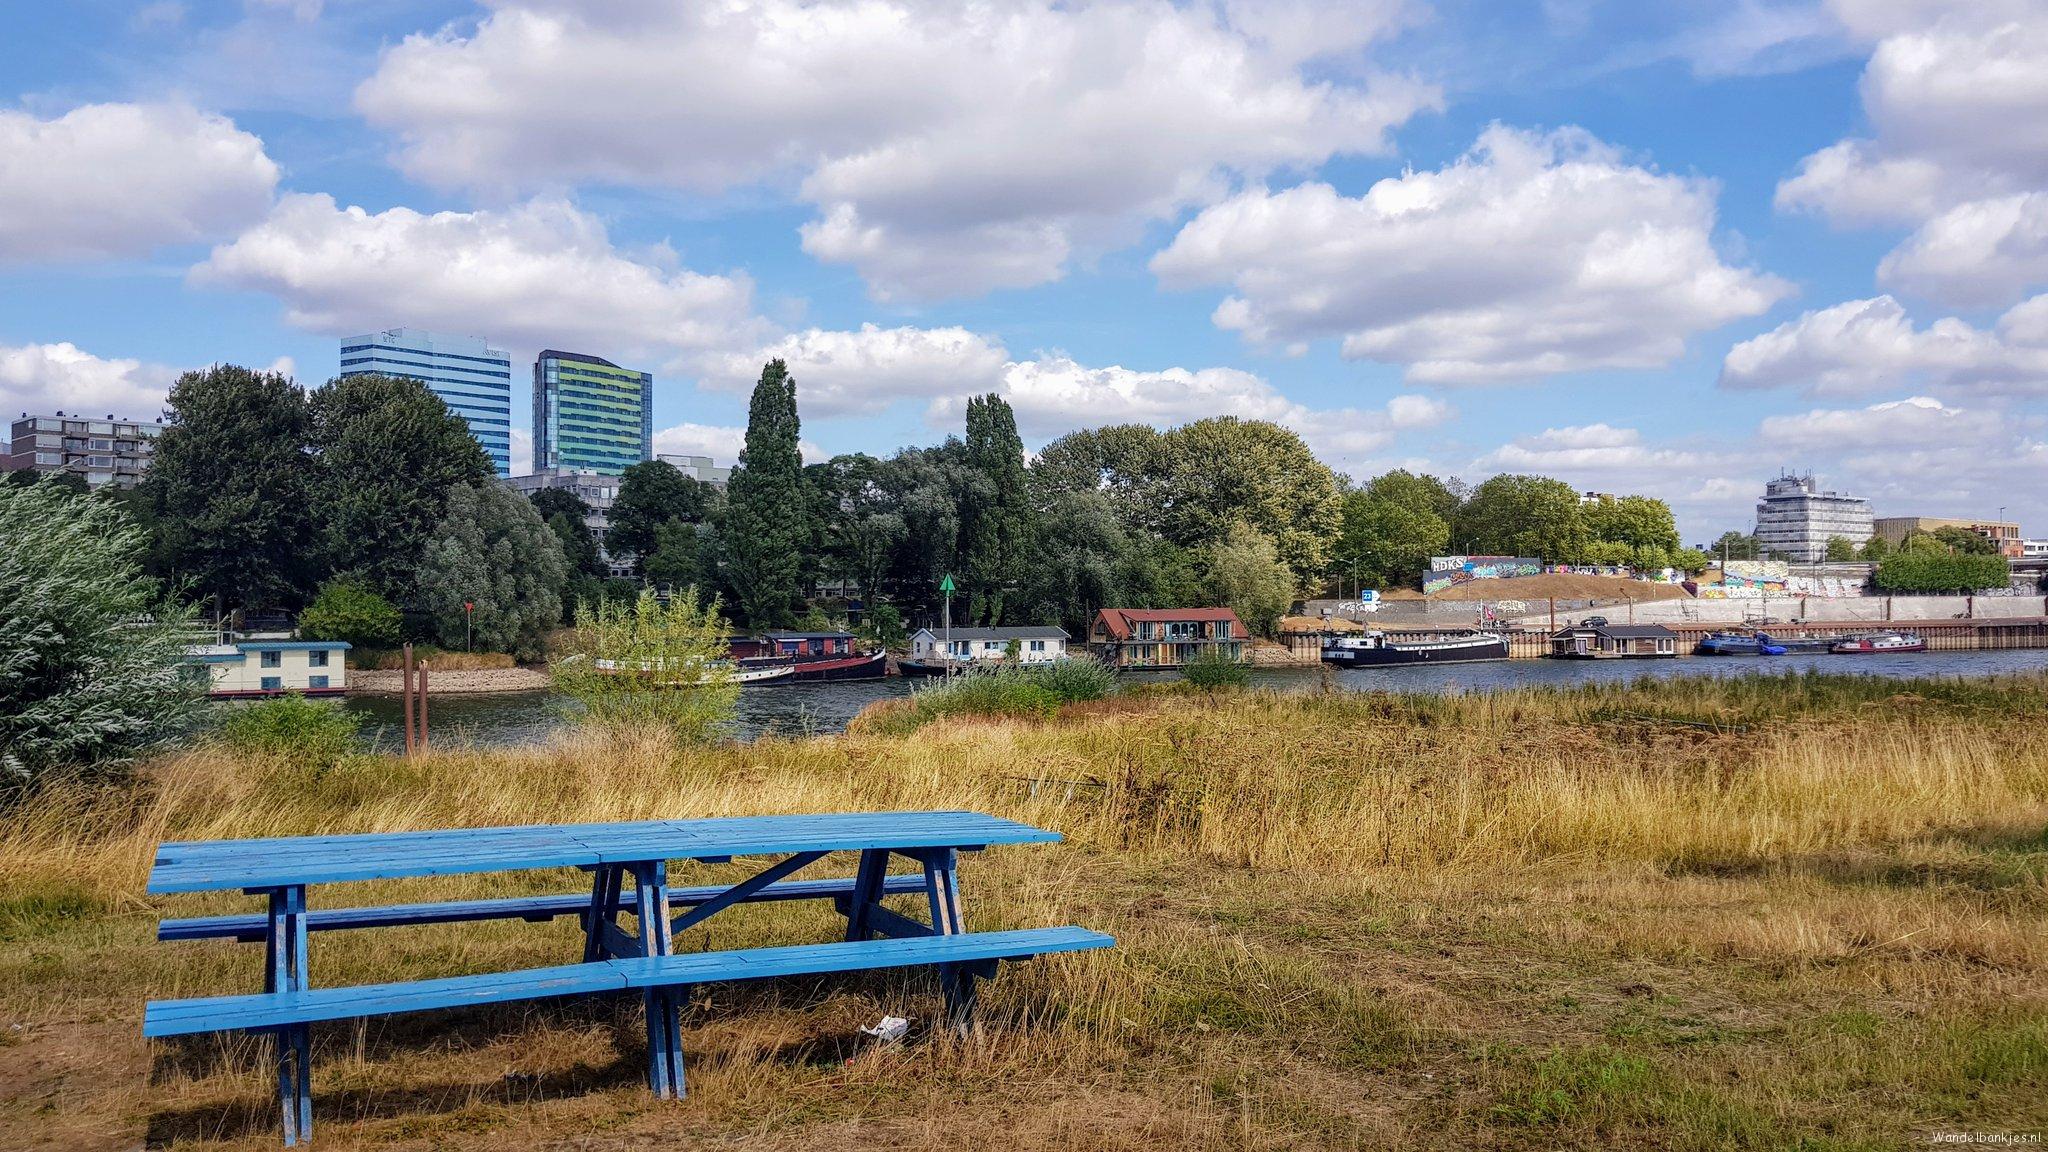 rt-wolfswandelplan-uiterwaardenpark-meinerswijk-in-arnhem-wandelbankjes-https-t-co-ybfdfhmfff